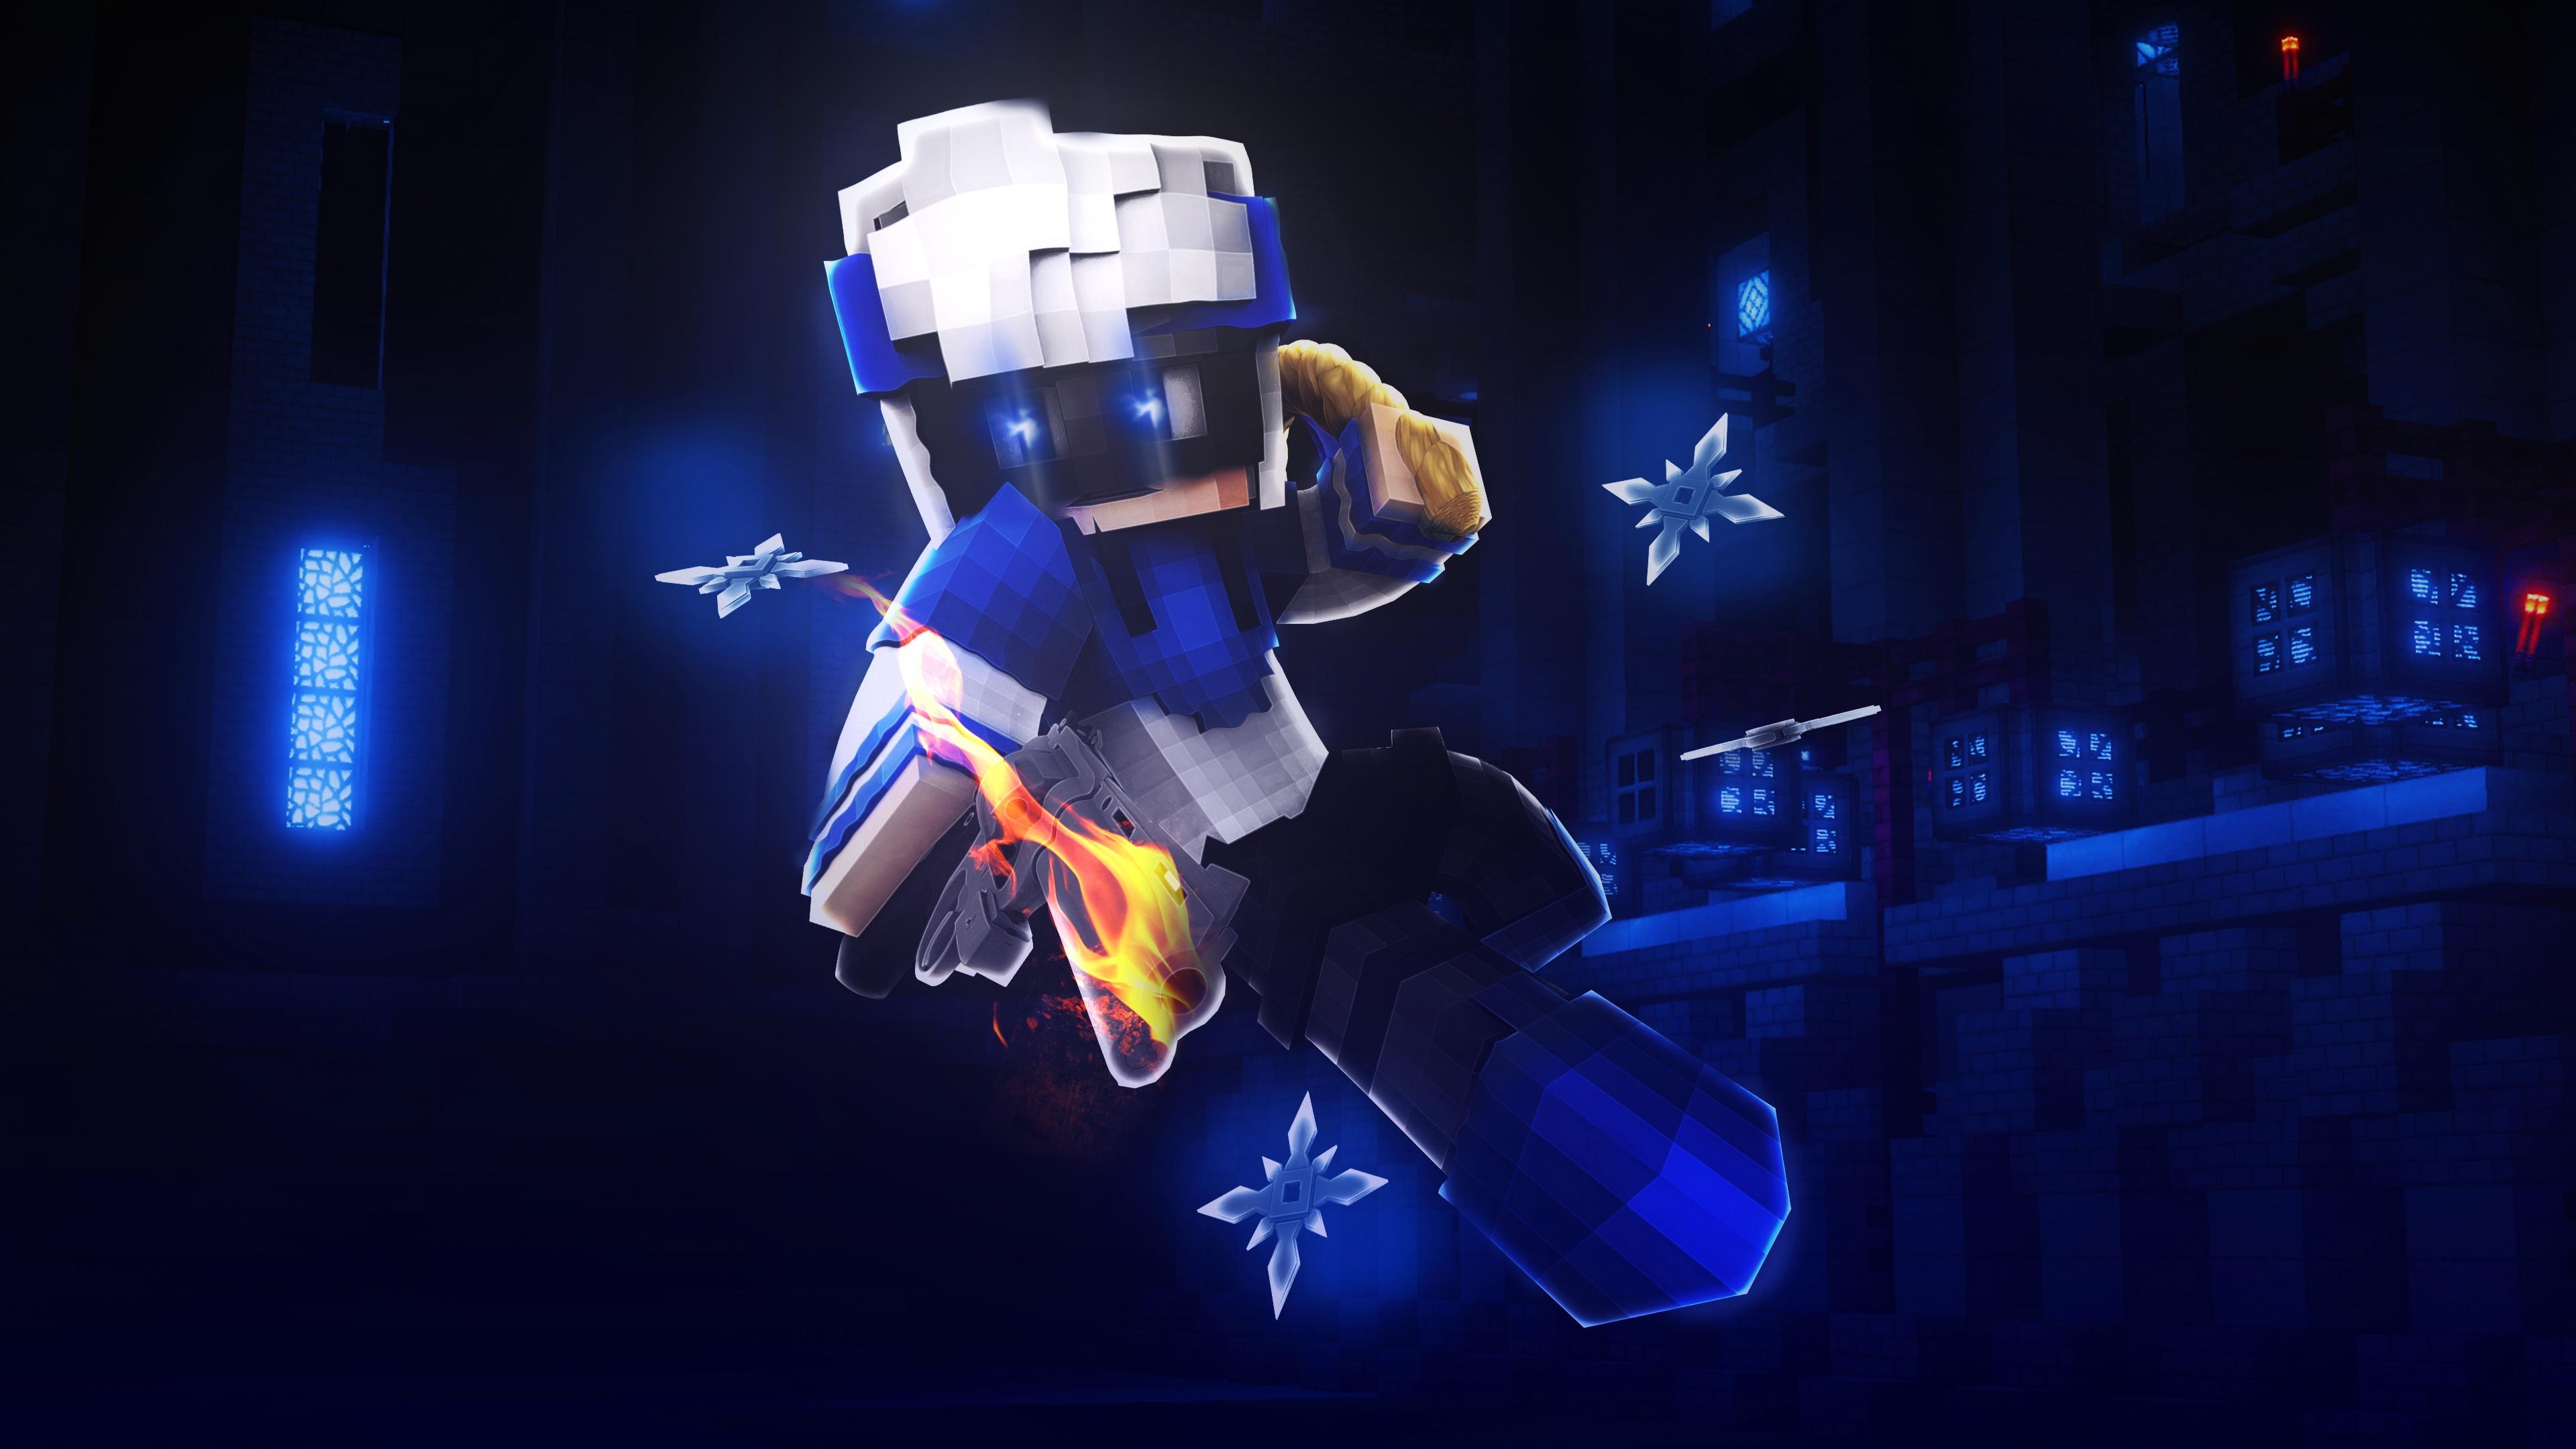 Wallpaper de Minecraft (de tu skin)